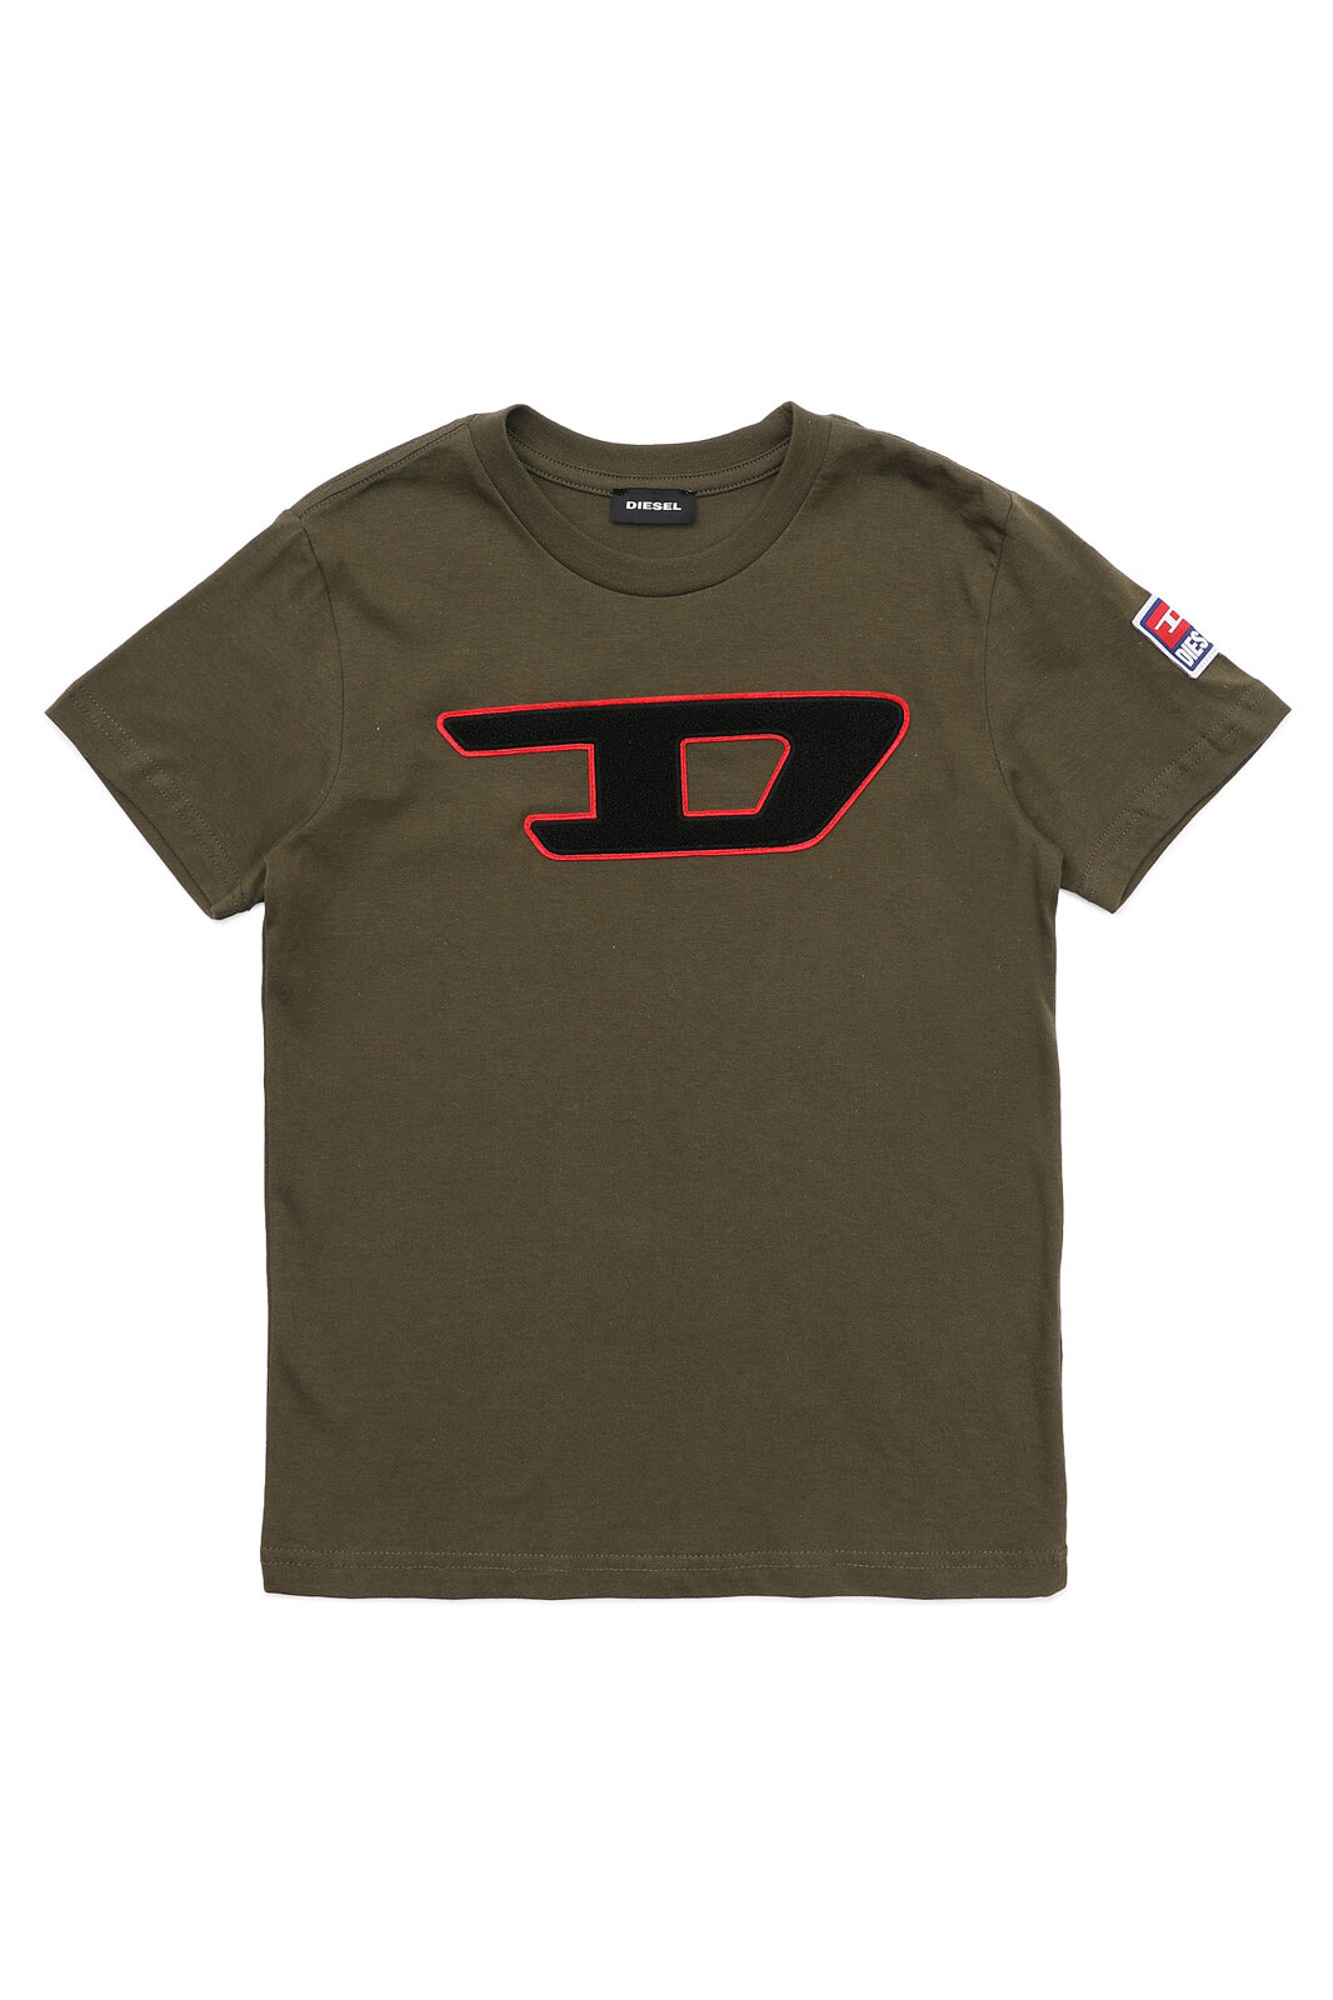 Tjustdivision-D T-Shirt - Diesel Kid